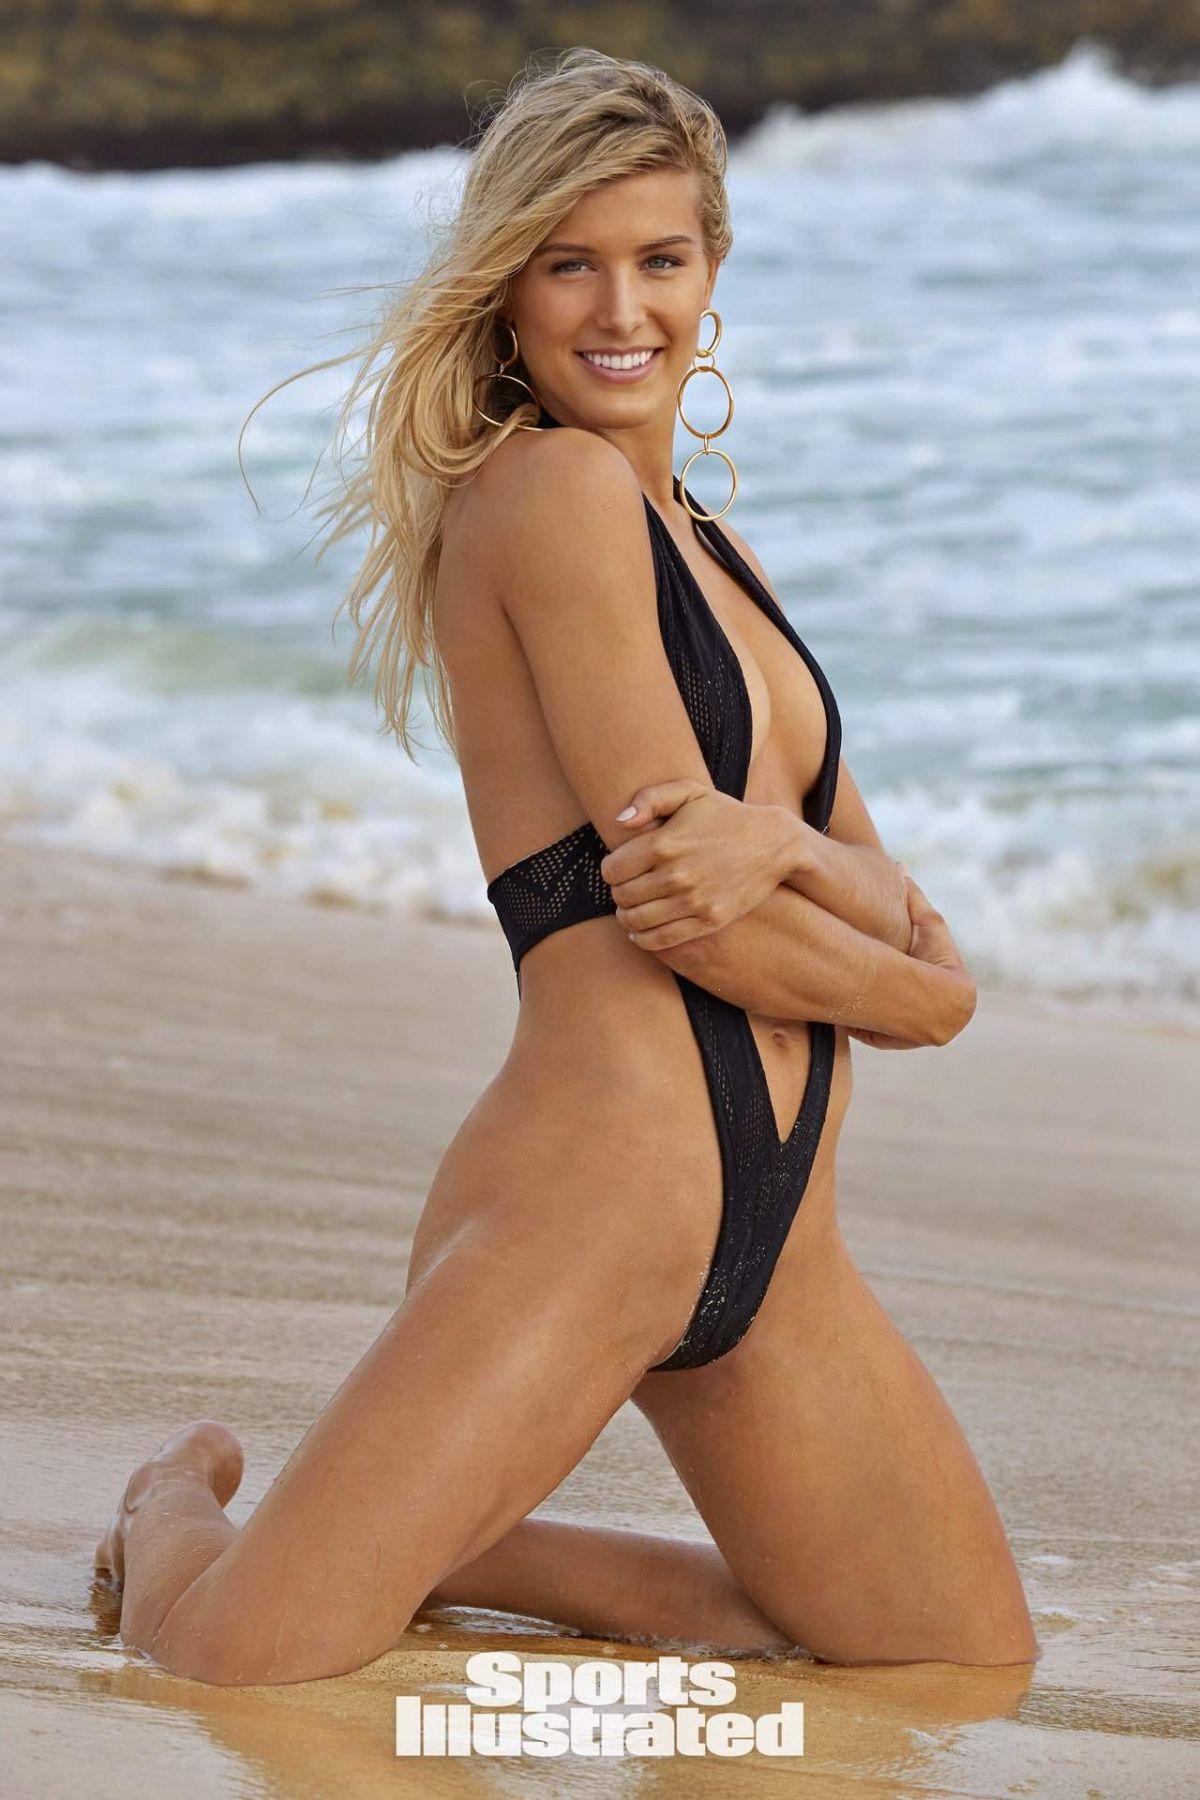 Eugenie Bouchard Sports Illustrated